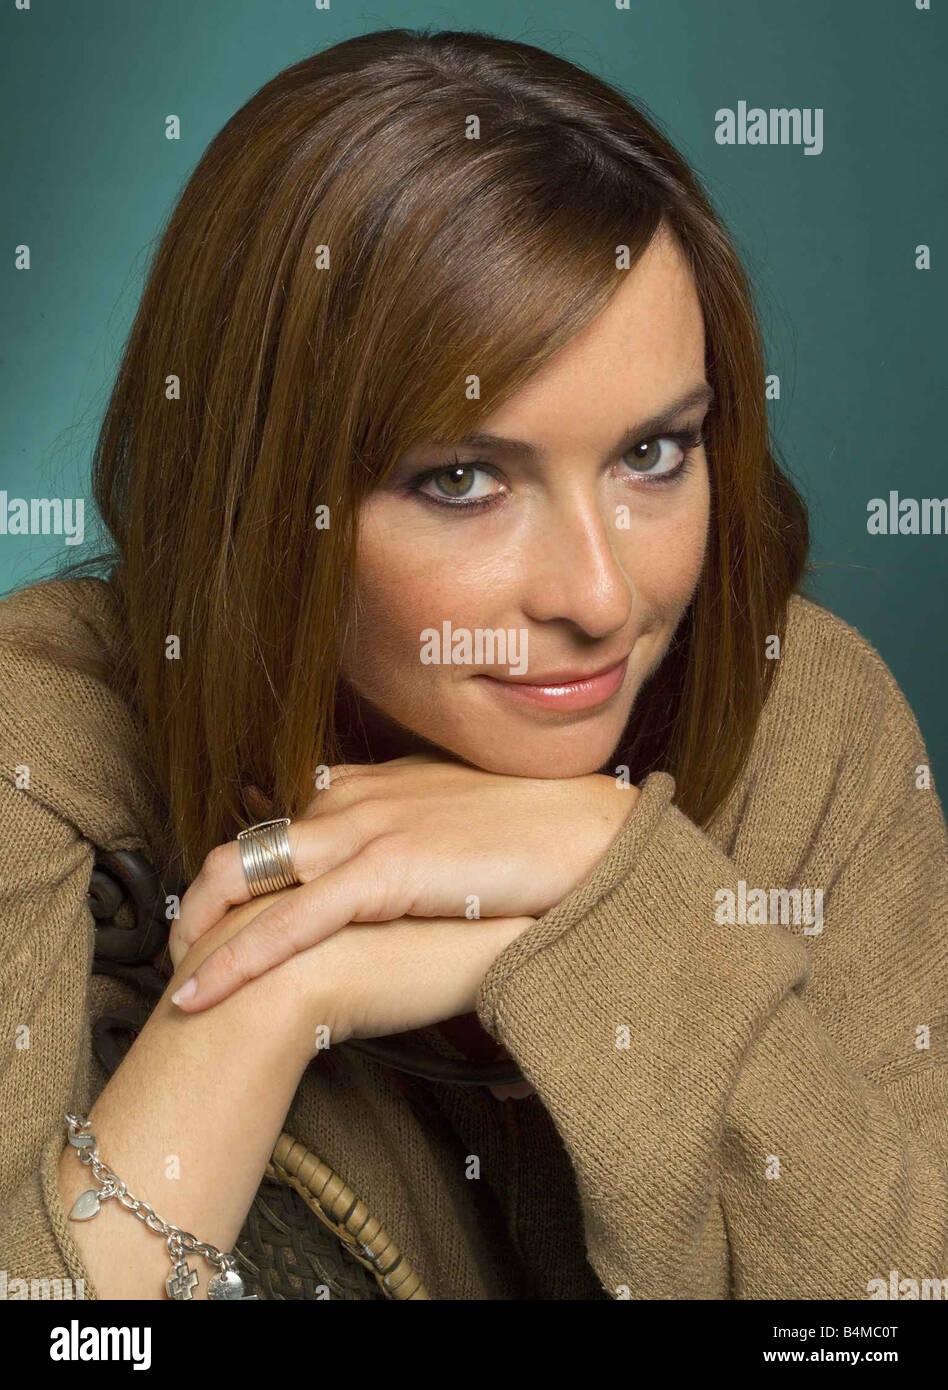 Suzi Perry June 2002 TV Presenter Studio Pix - Stock Image